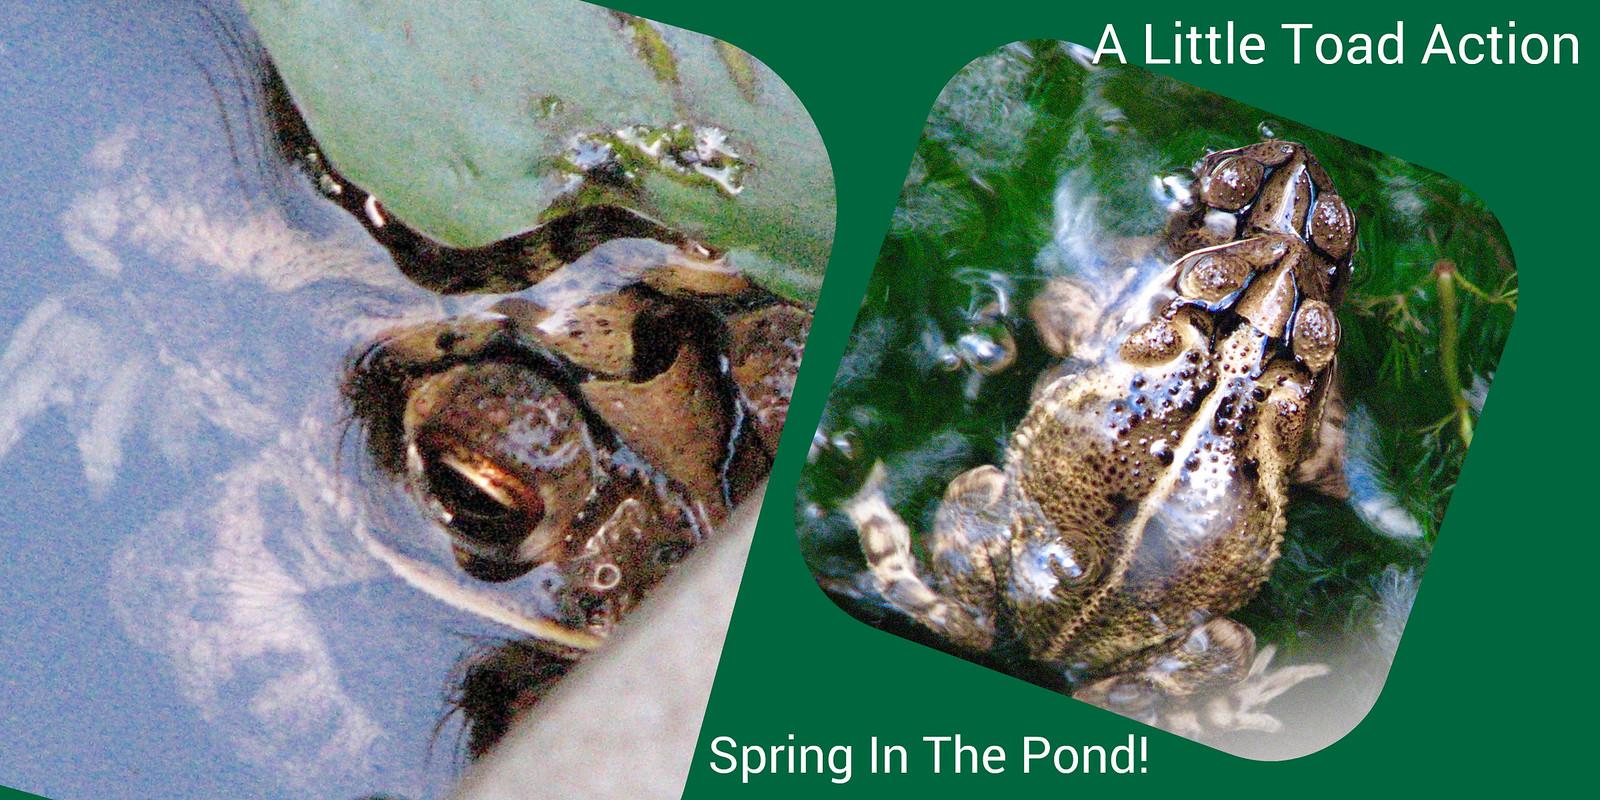 Spring In The Pond